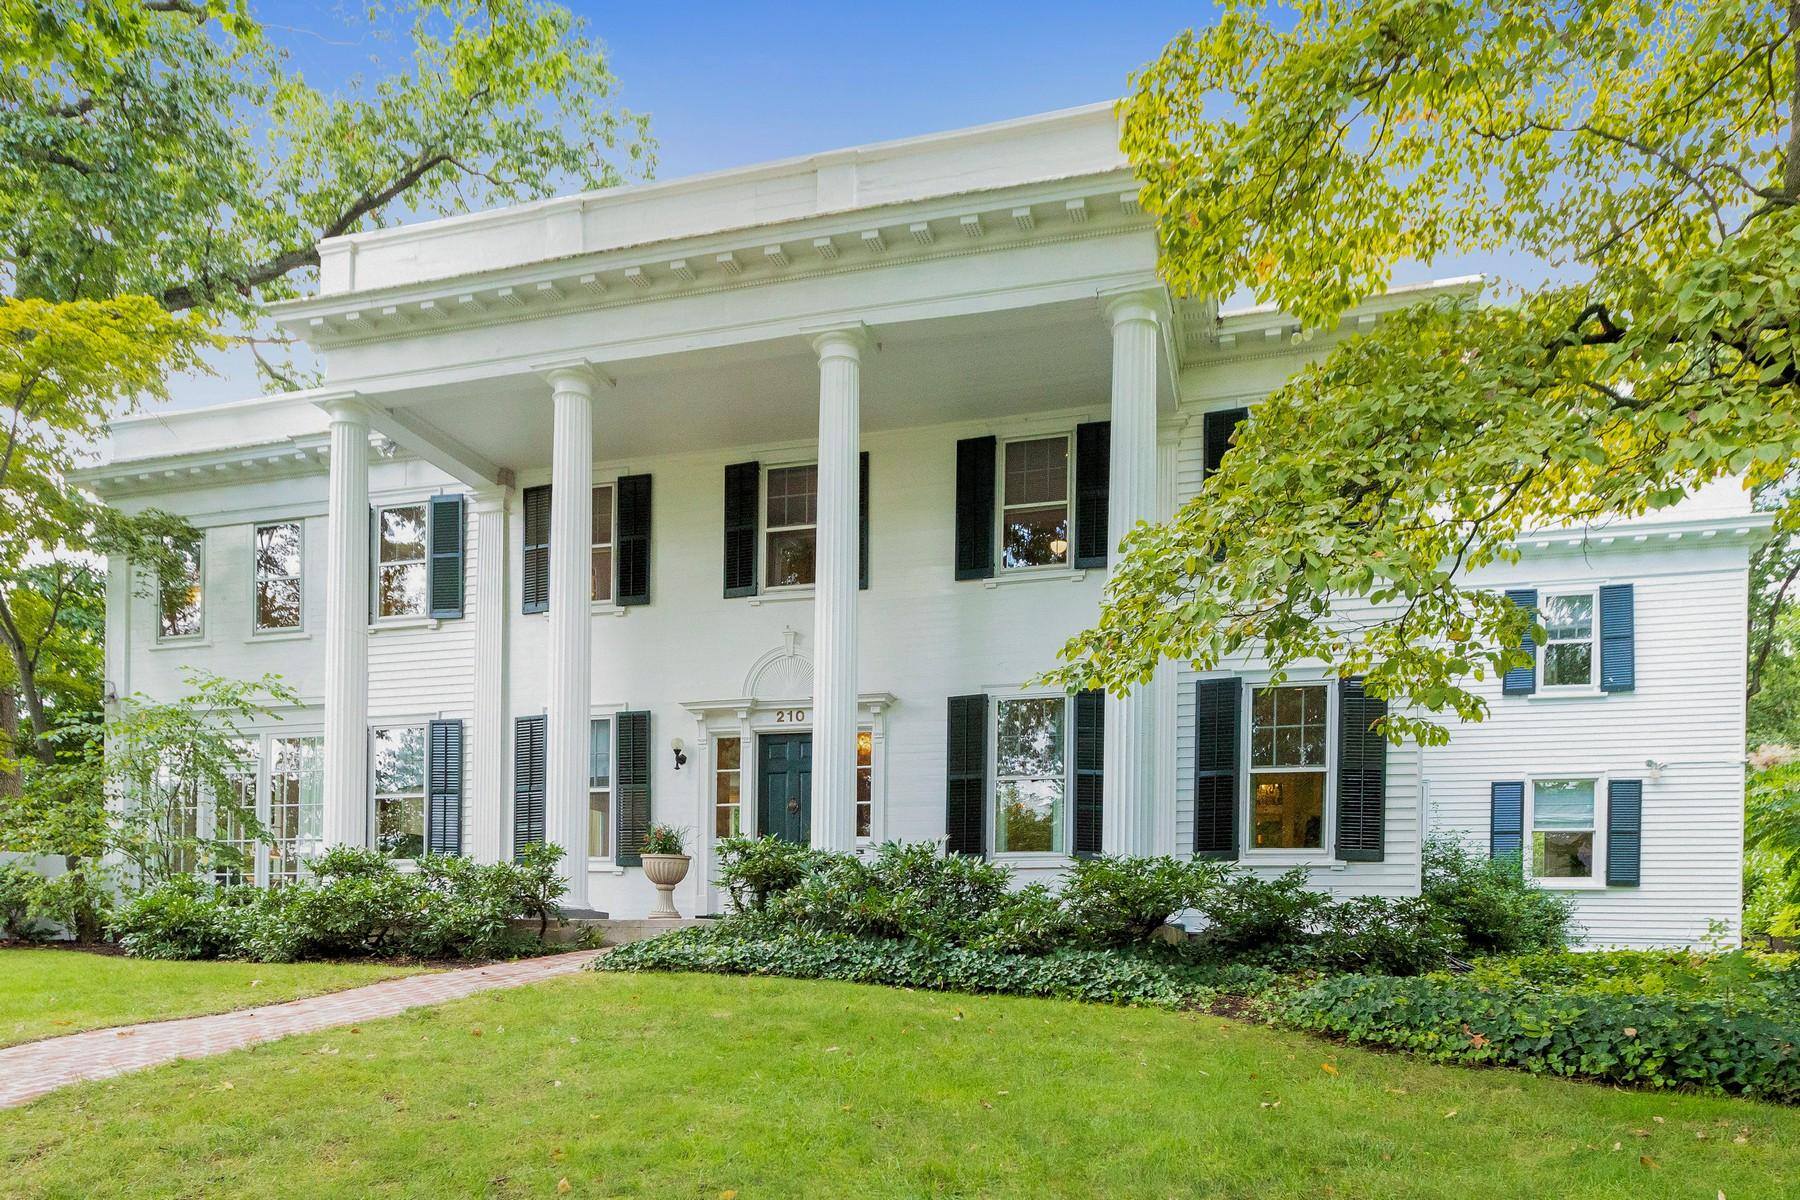 Single Family Homes для того Продажа на Perfect In Every Way! 210 Christopher Street, Montclair, Нью-Джерси 07043 Соединенные Штаты